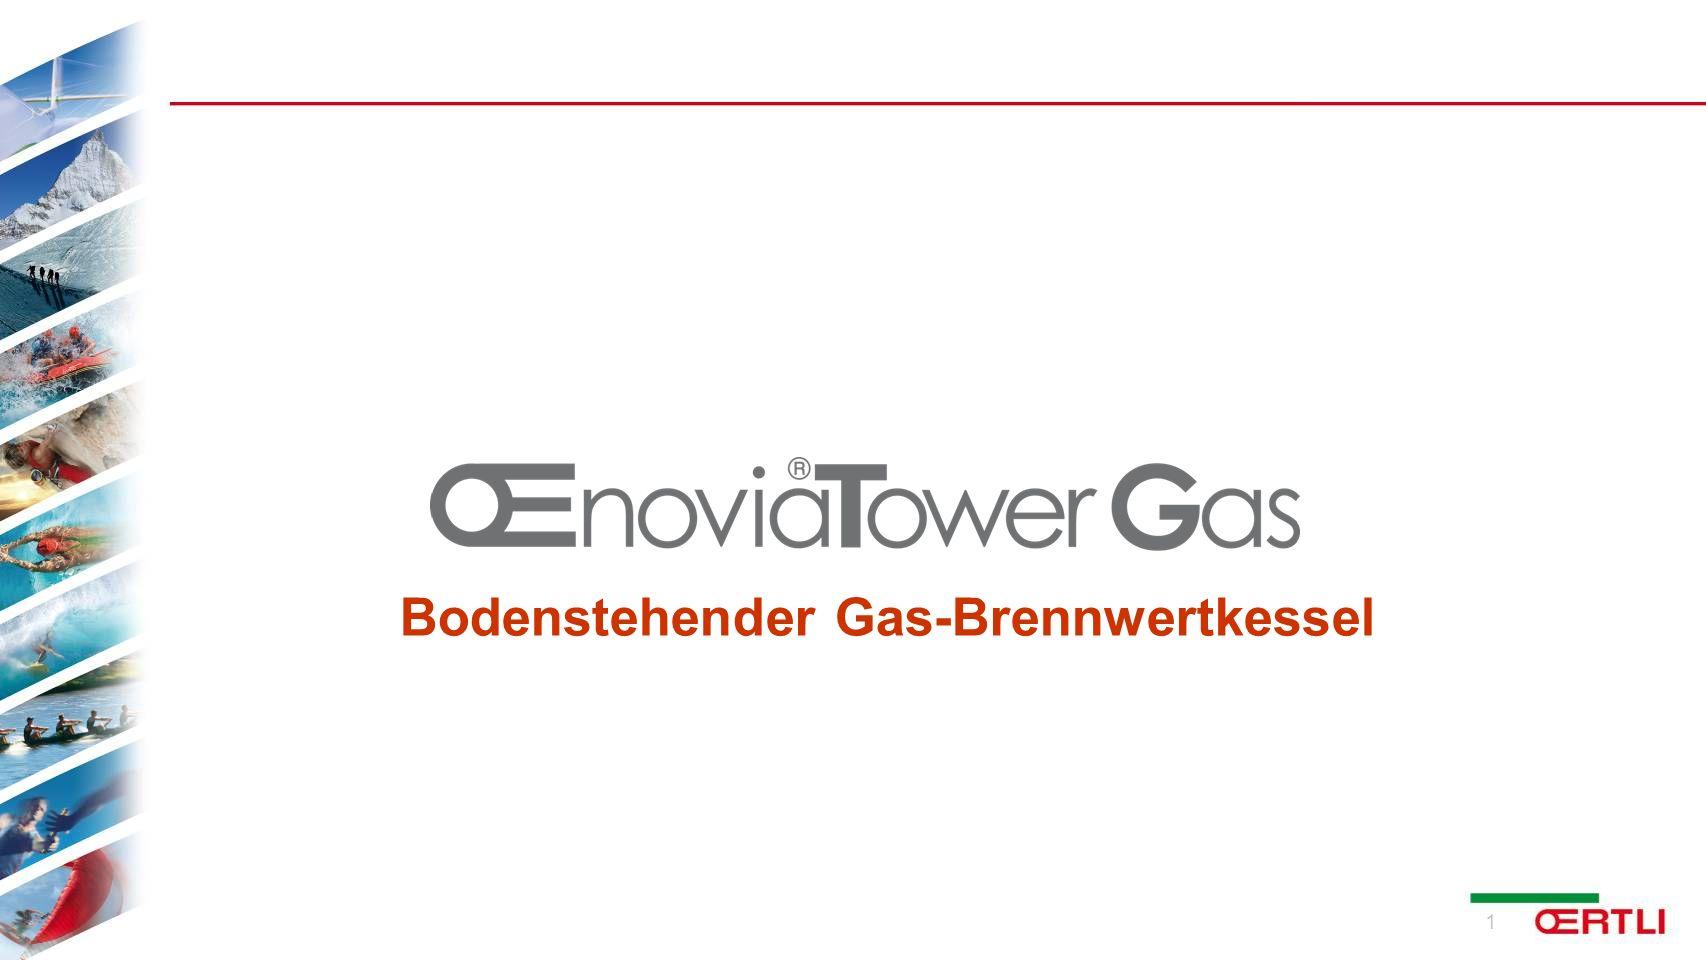 2 Übergreifendes Projekt: Gasbrennwert / Ölbrennwert